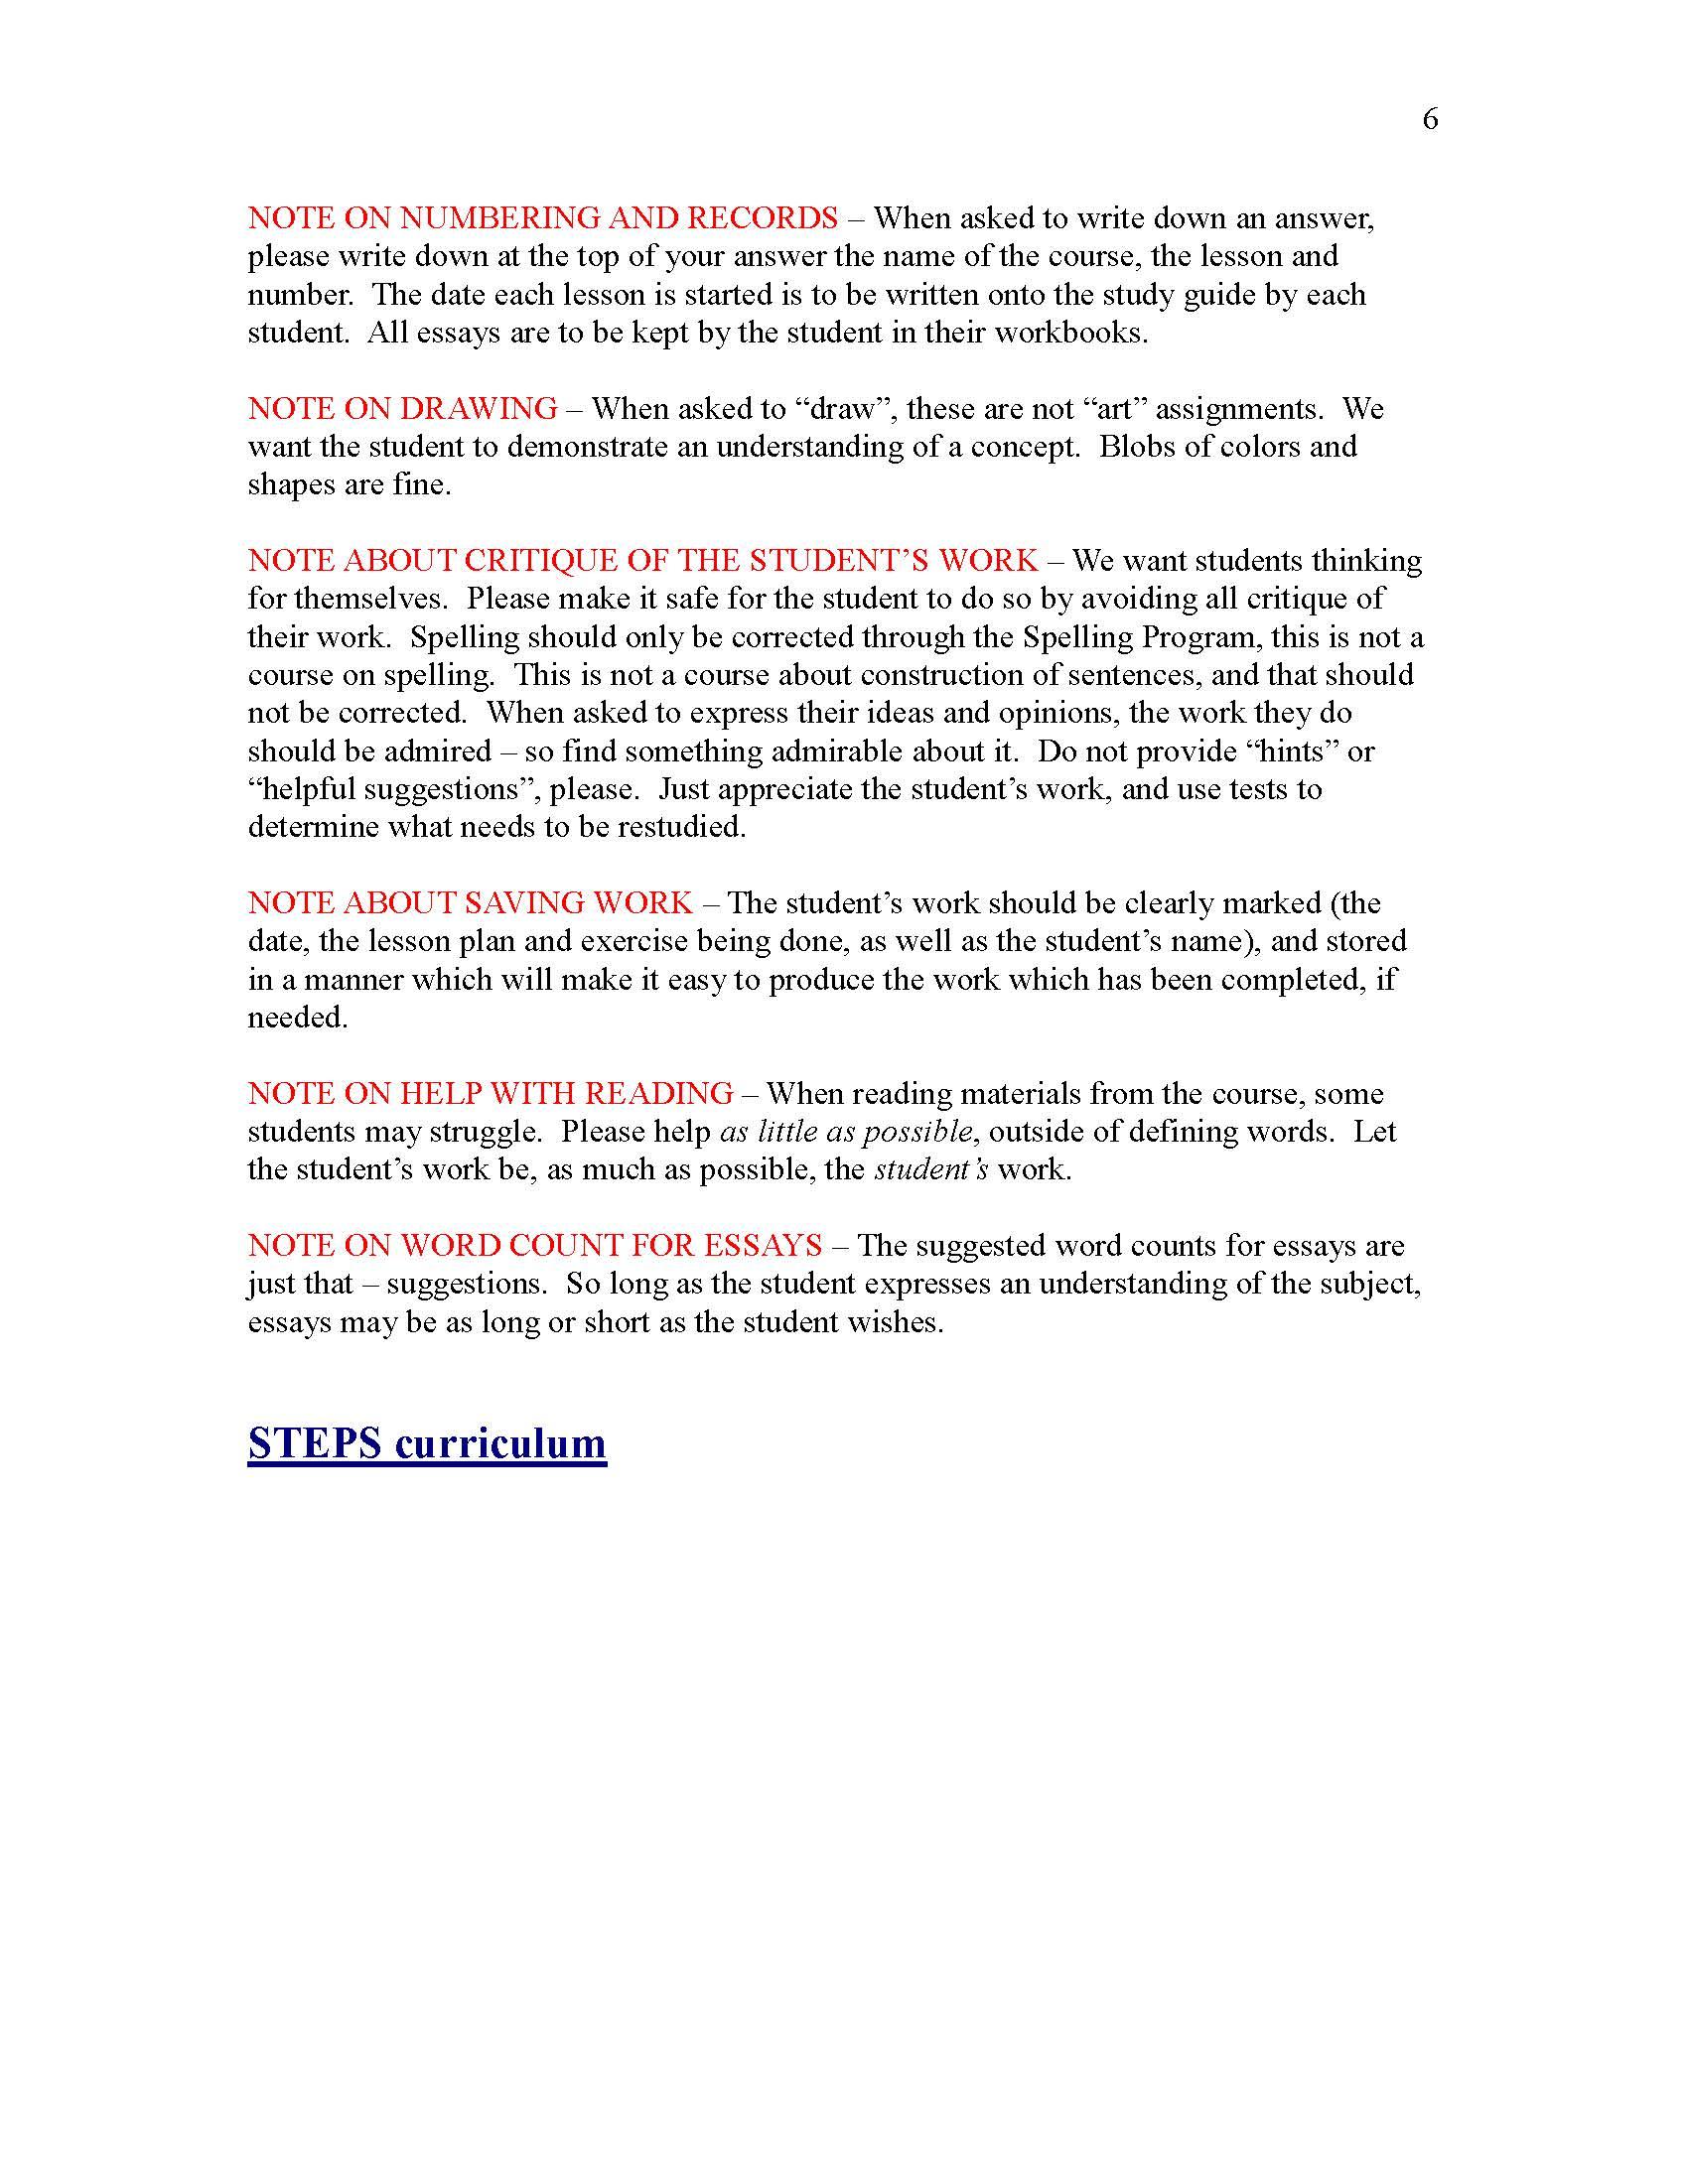 STEP 4 Science 5 Chemistry_Page_007.jpg